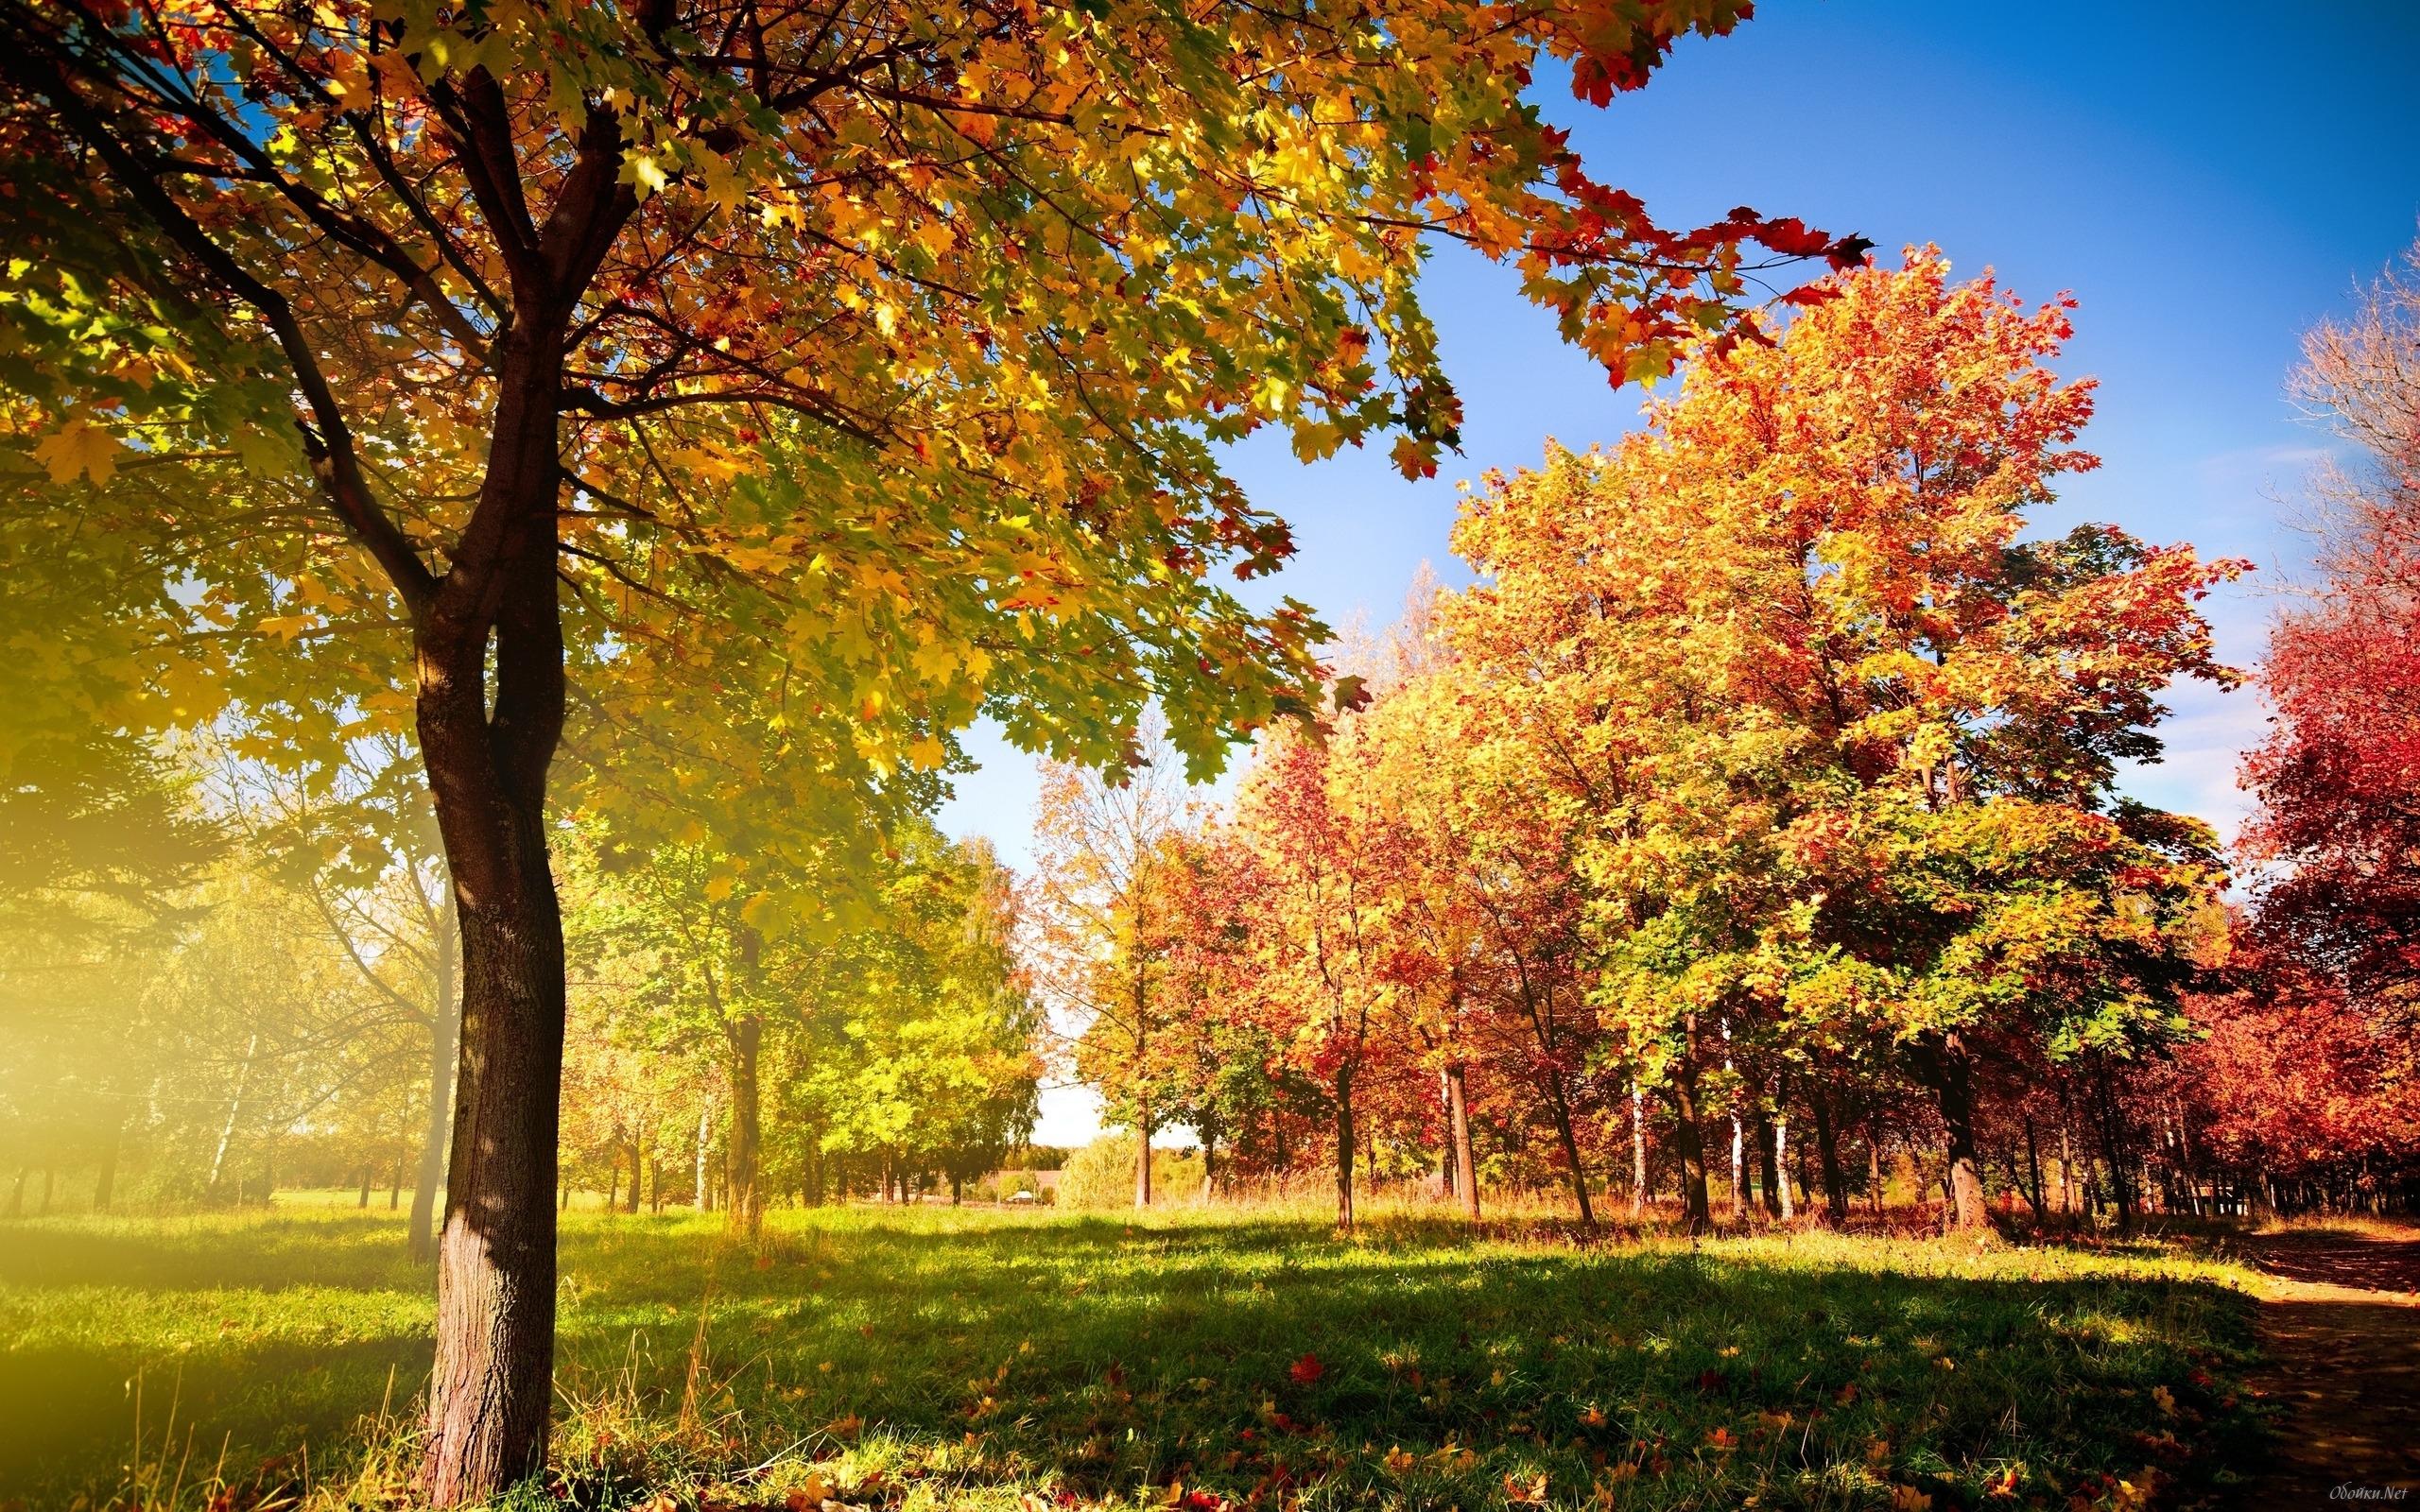 Color early fall HD Desktop Wallpaper HD Desktop Wallpaper 2560x1600